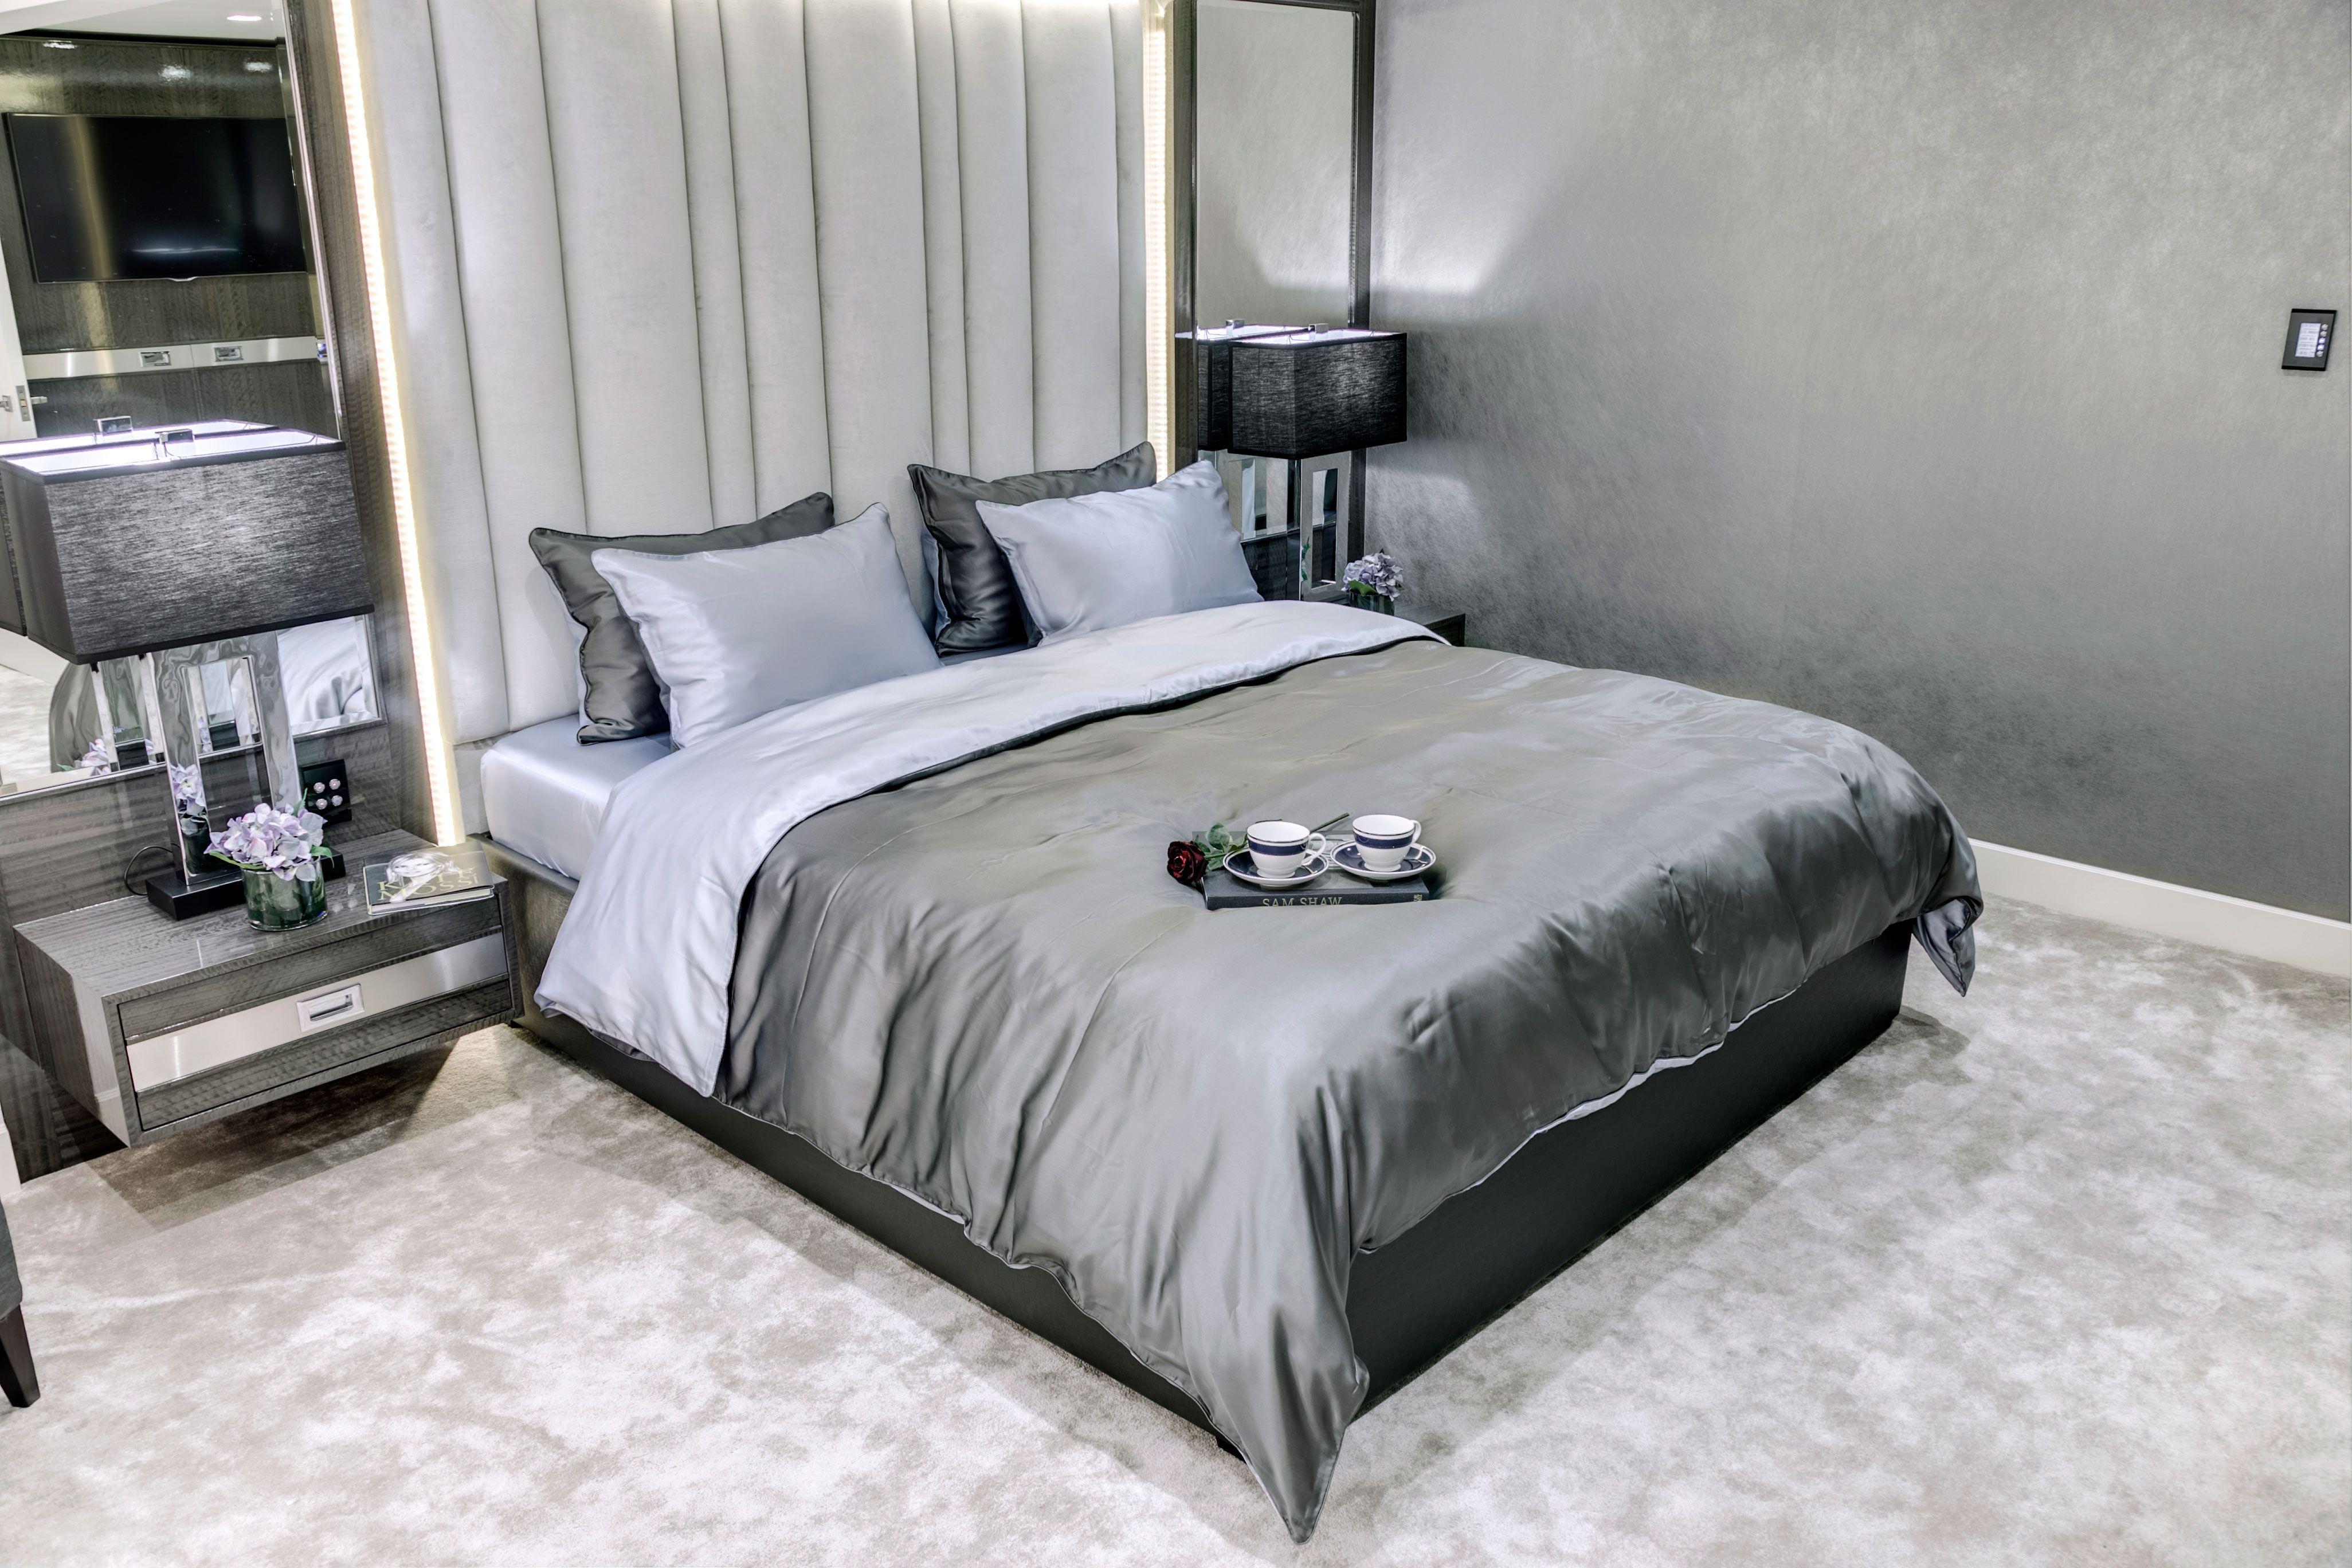 Theo Headboard | Headboards for beds, Luxury bedroom ...